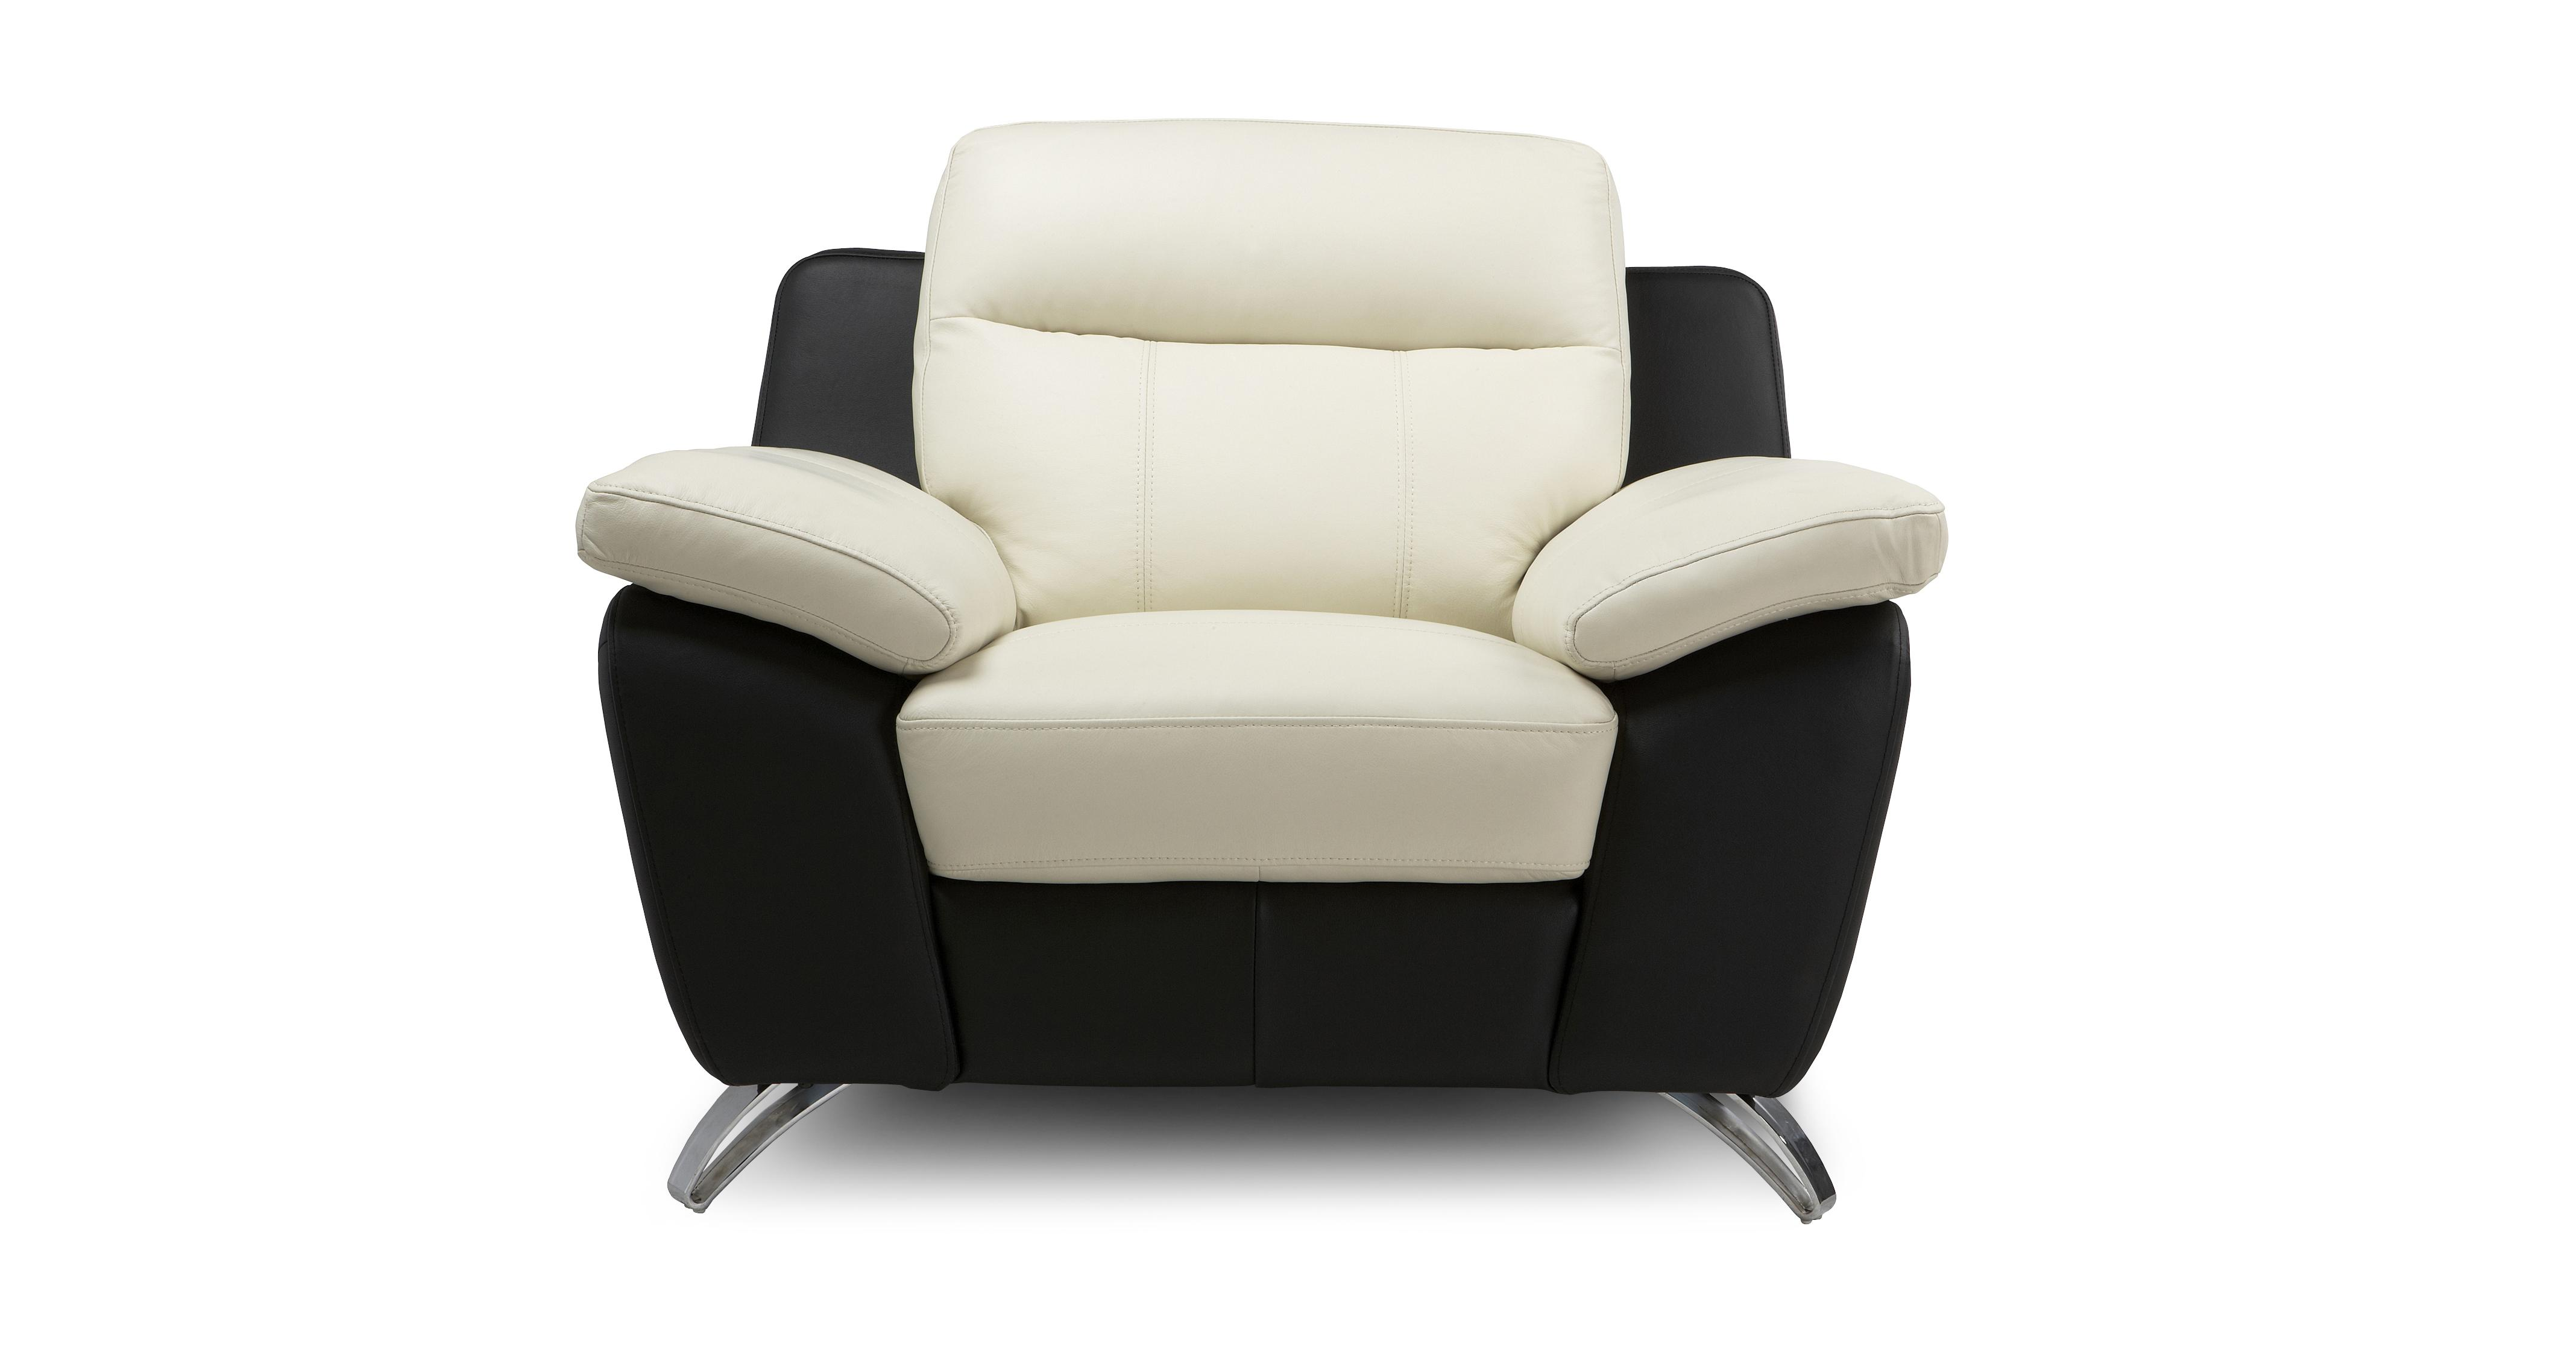 bedroom chair dfs aqua slipper dice armchair peru ireland